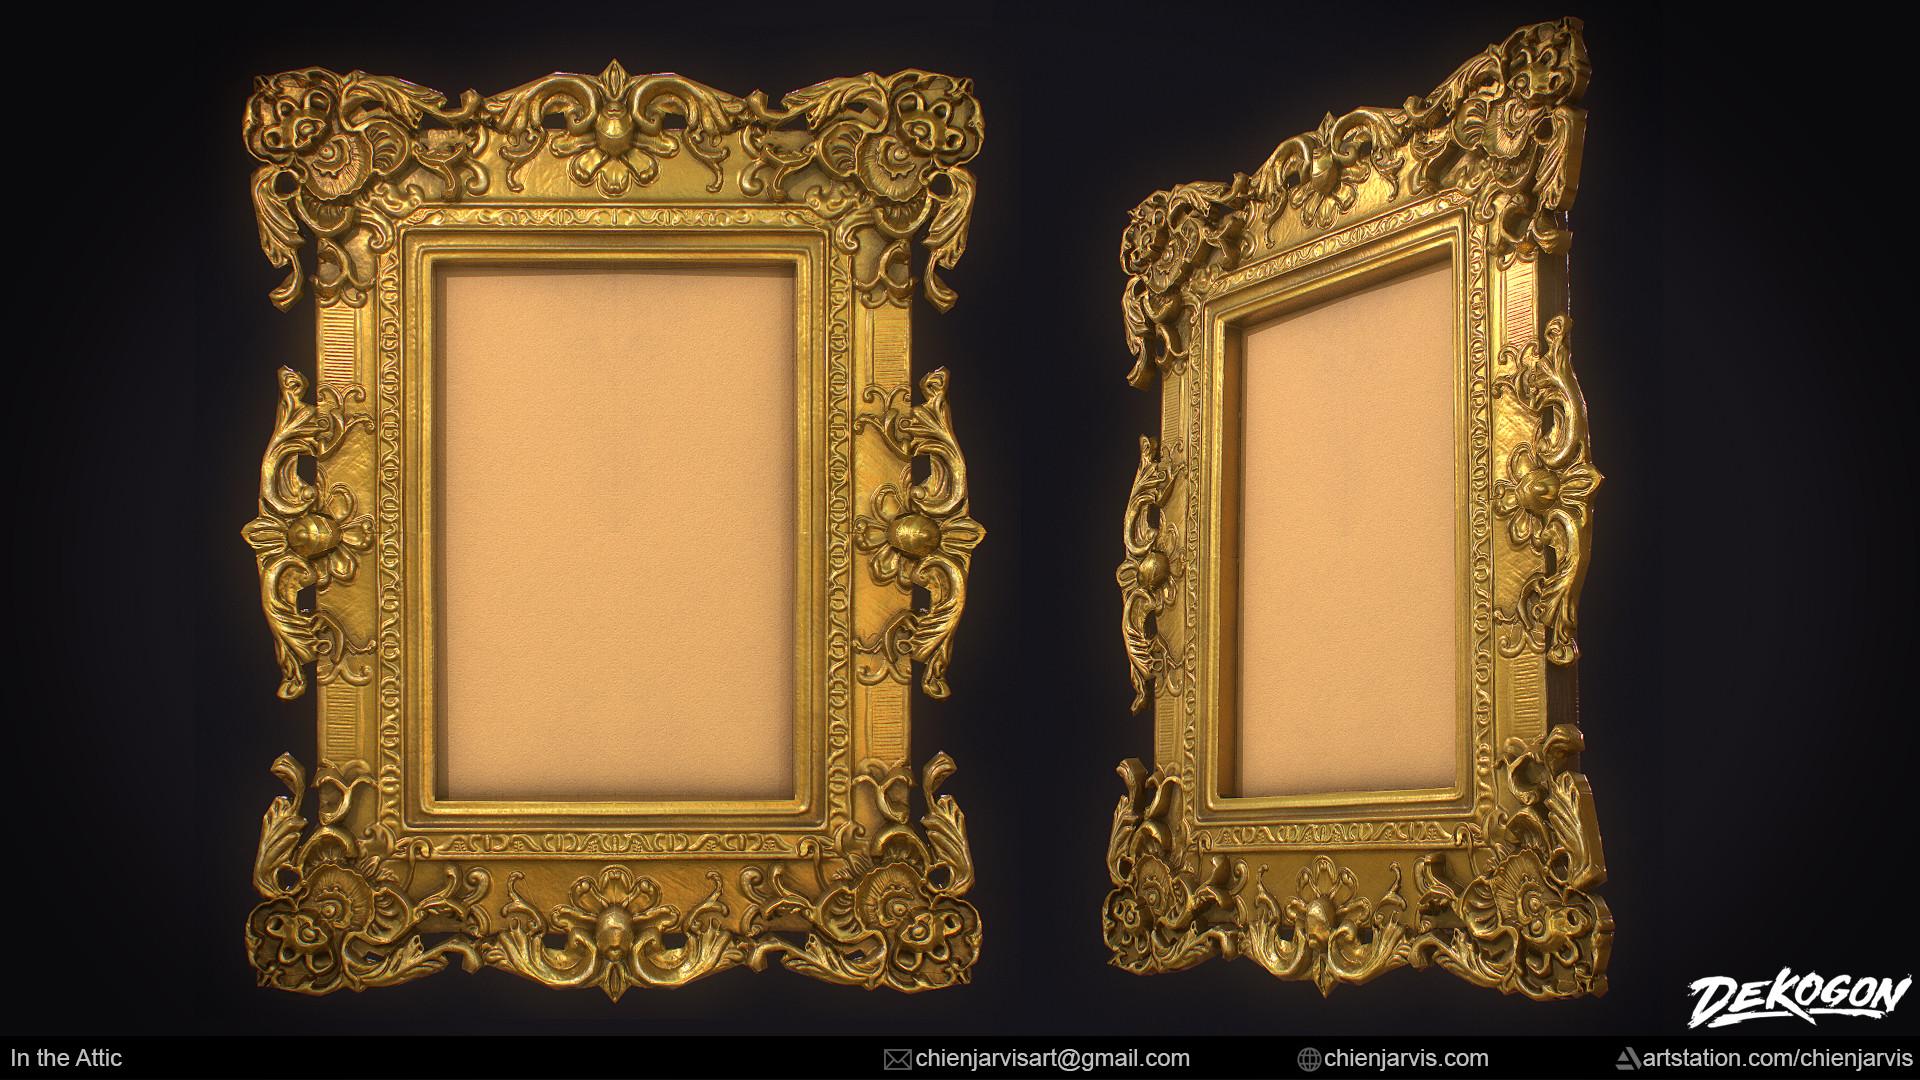 Chien jarvis dekogon frame chien jarvis 03